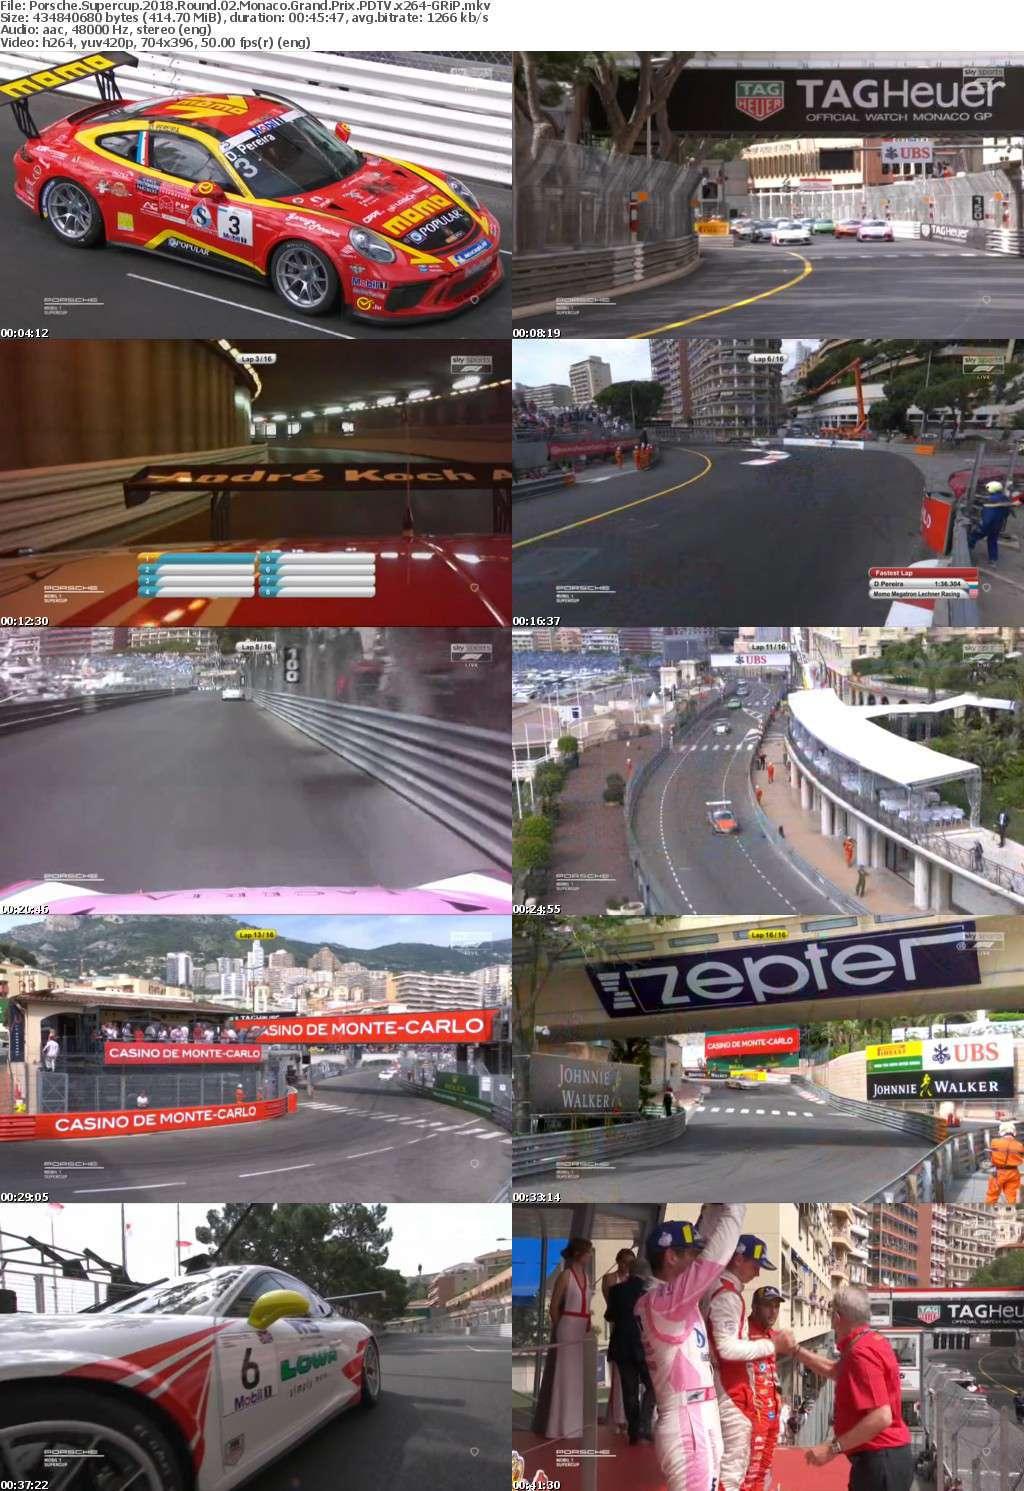 Porsche Supercup 2018 Round 02 Monaco Grand Prix PDTV x264-GRiP